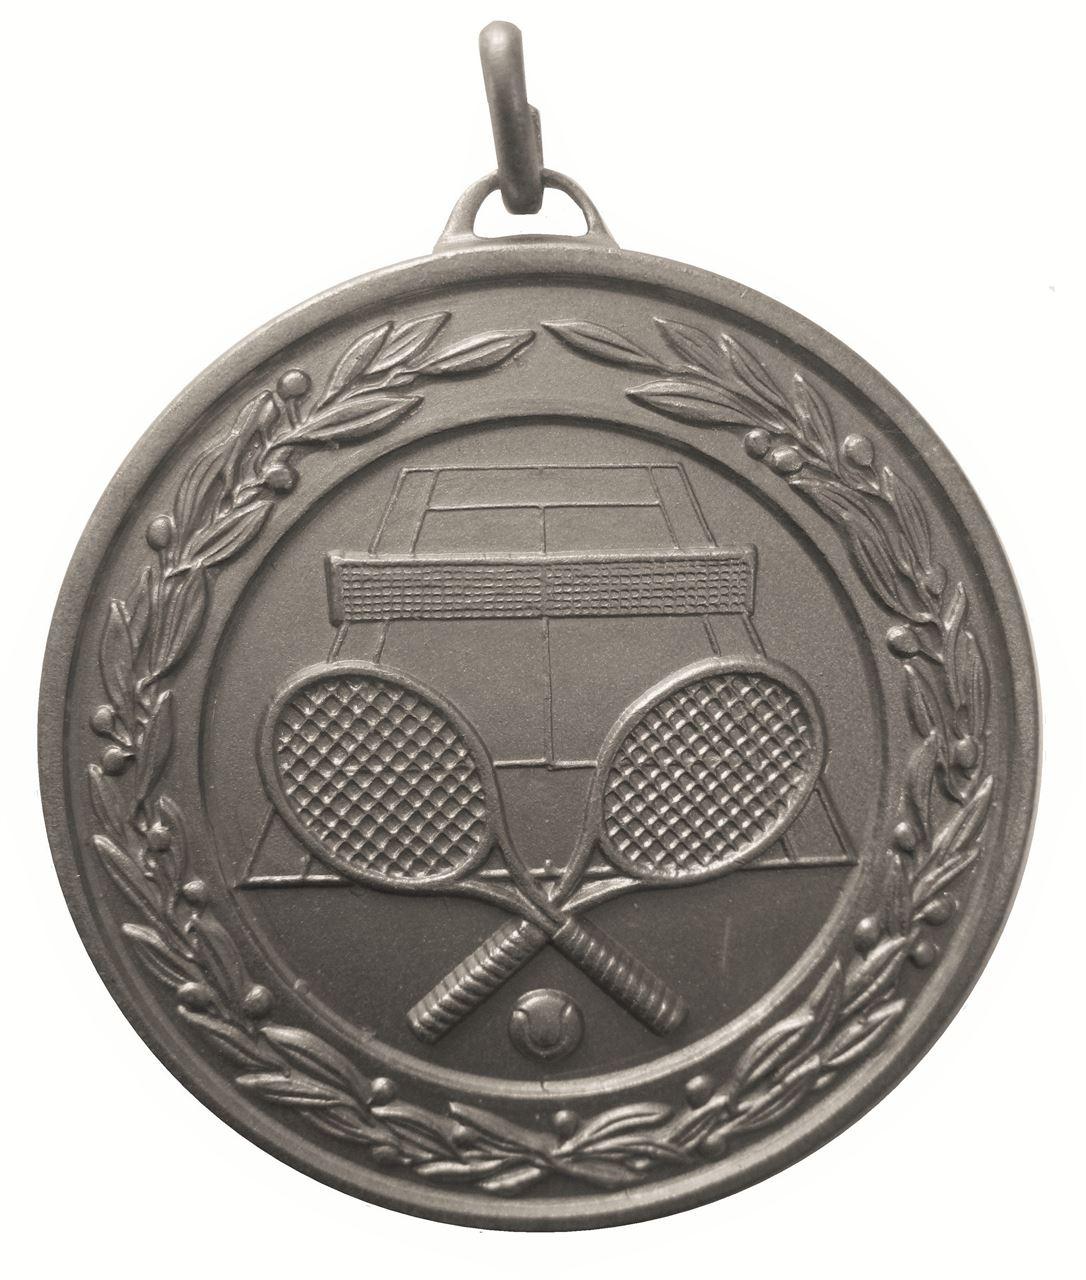 Silver Laurel Economy Tennis Medal (size: 50mm) - 9621E